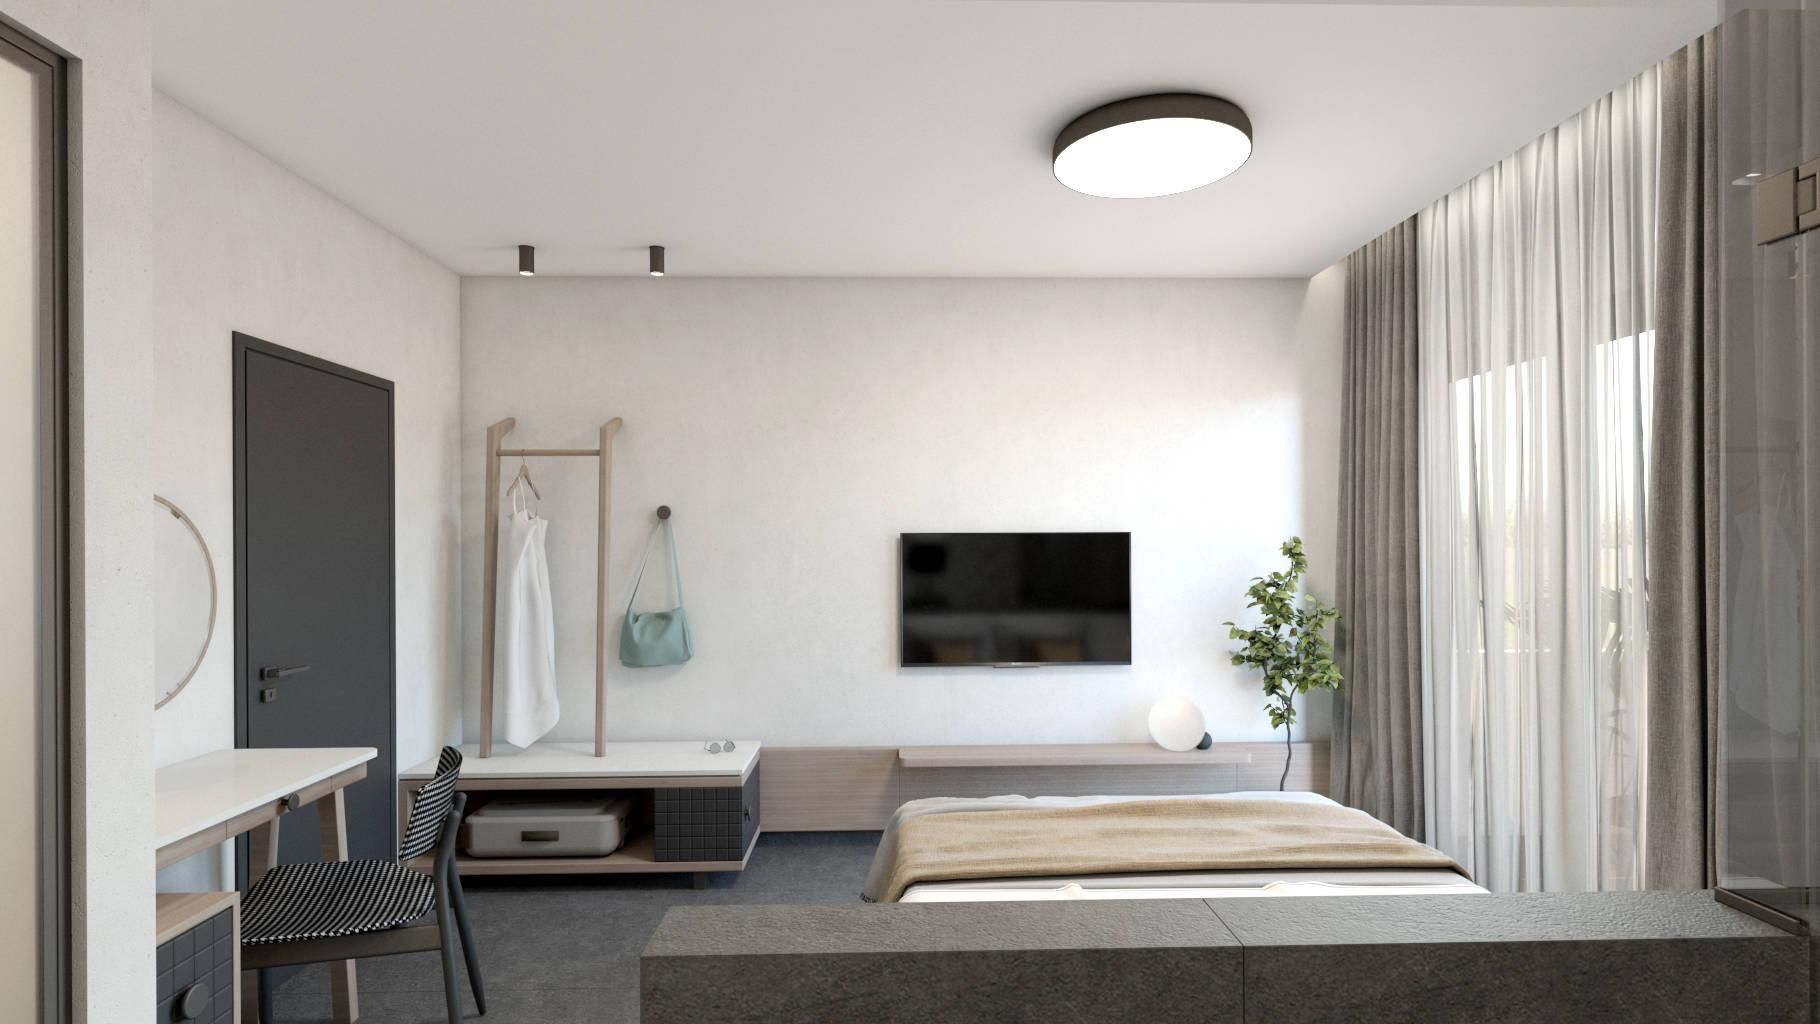 Double hotel room, interior design, bed, open wardrobe and dressing table. Δίκλινο δωμάτιο ξενοδοχείου, κρεβάτι, ανοιχτή ντουλάπα και γραφείο.